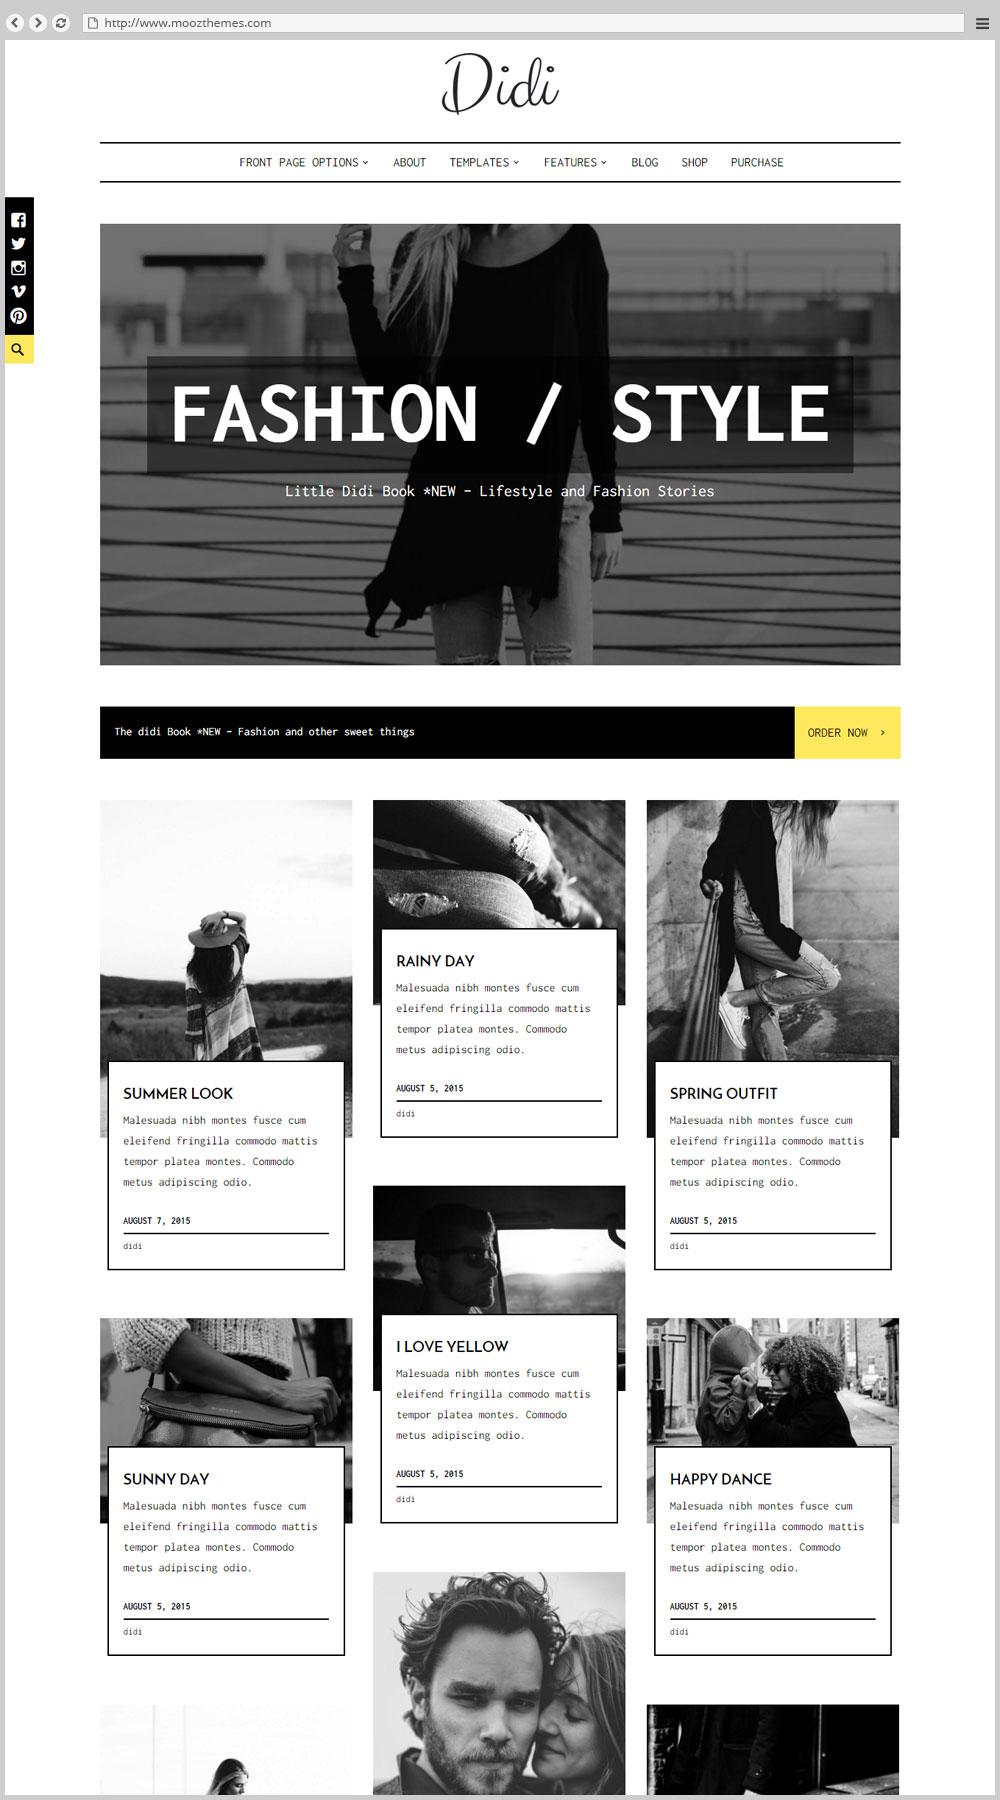 how to create a fashion blog on wordpress